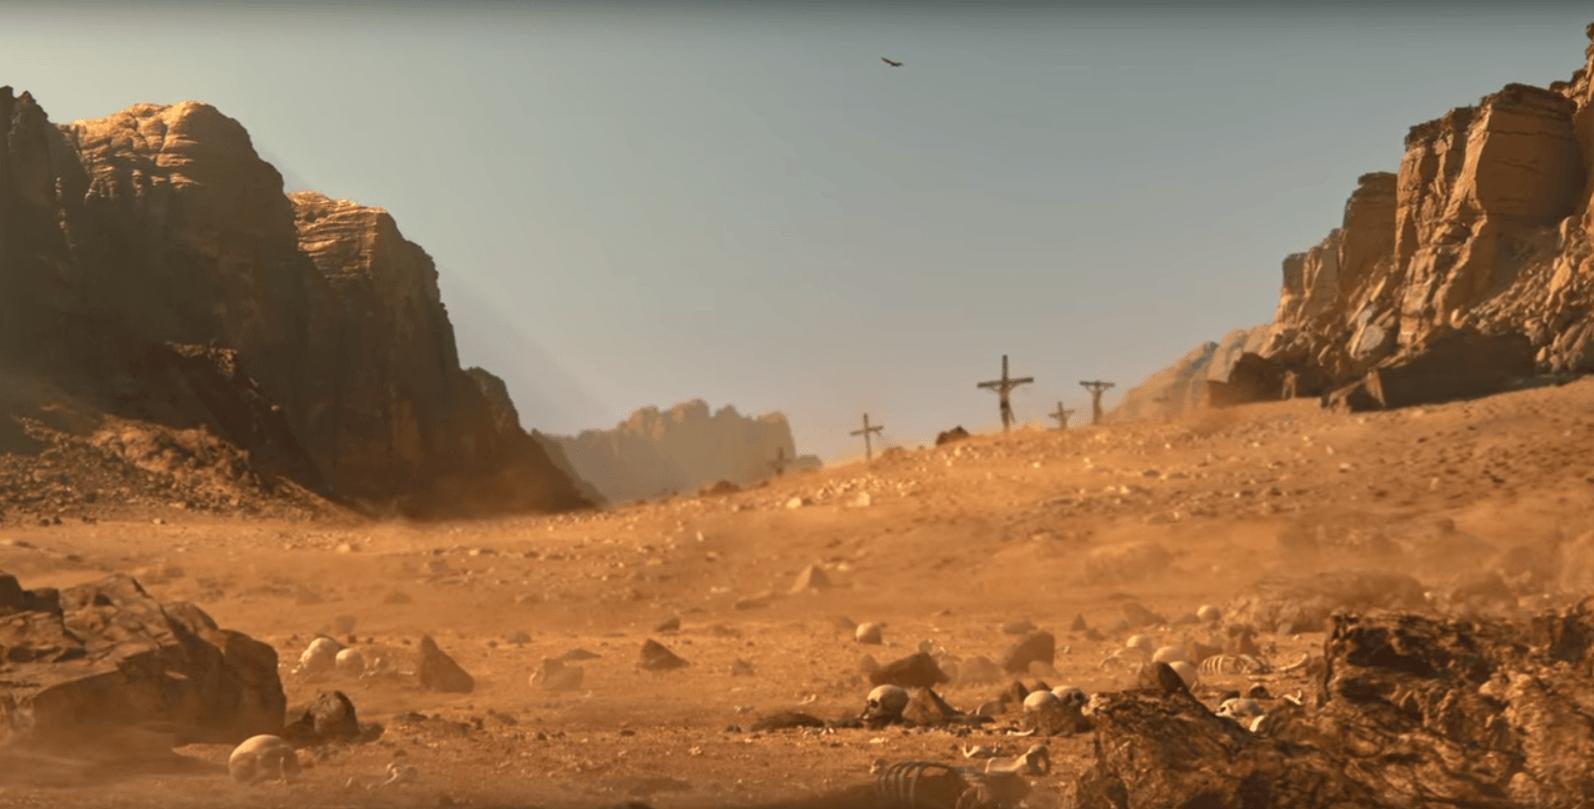 Conan Exiles: Survival Open-World-Spiel klingt wie Ark, soll im Sommer kommen